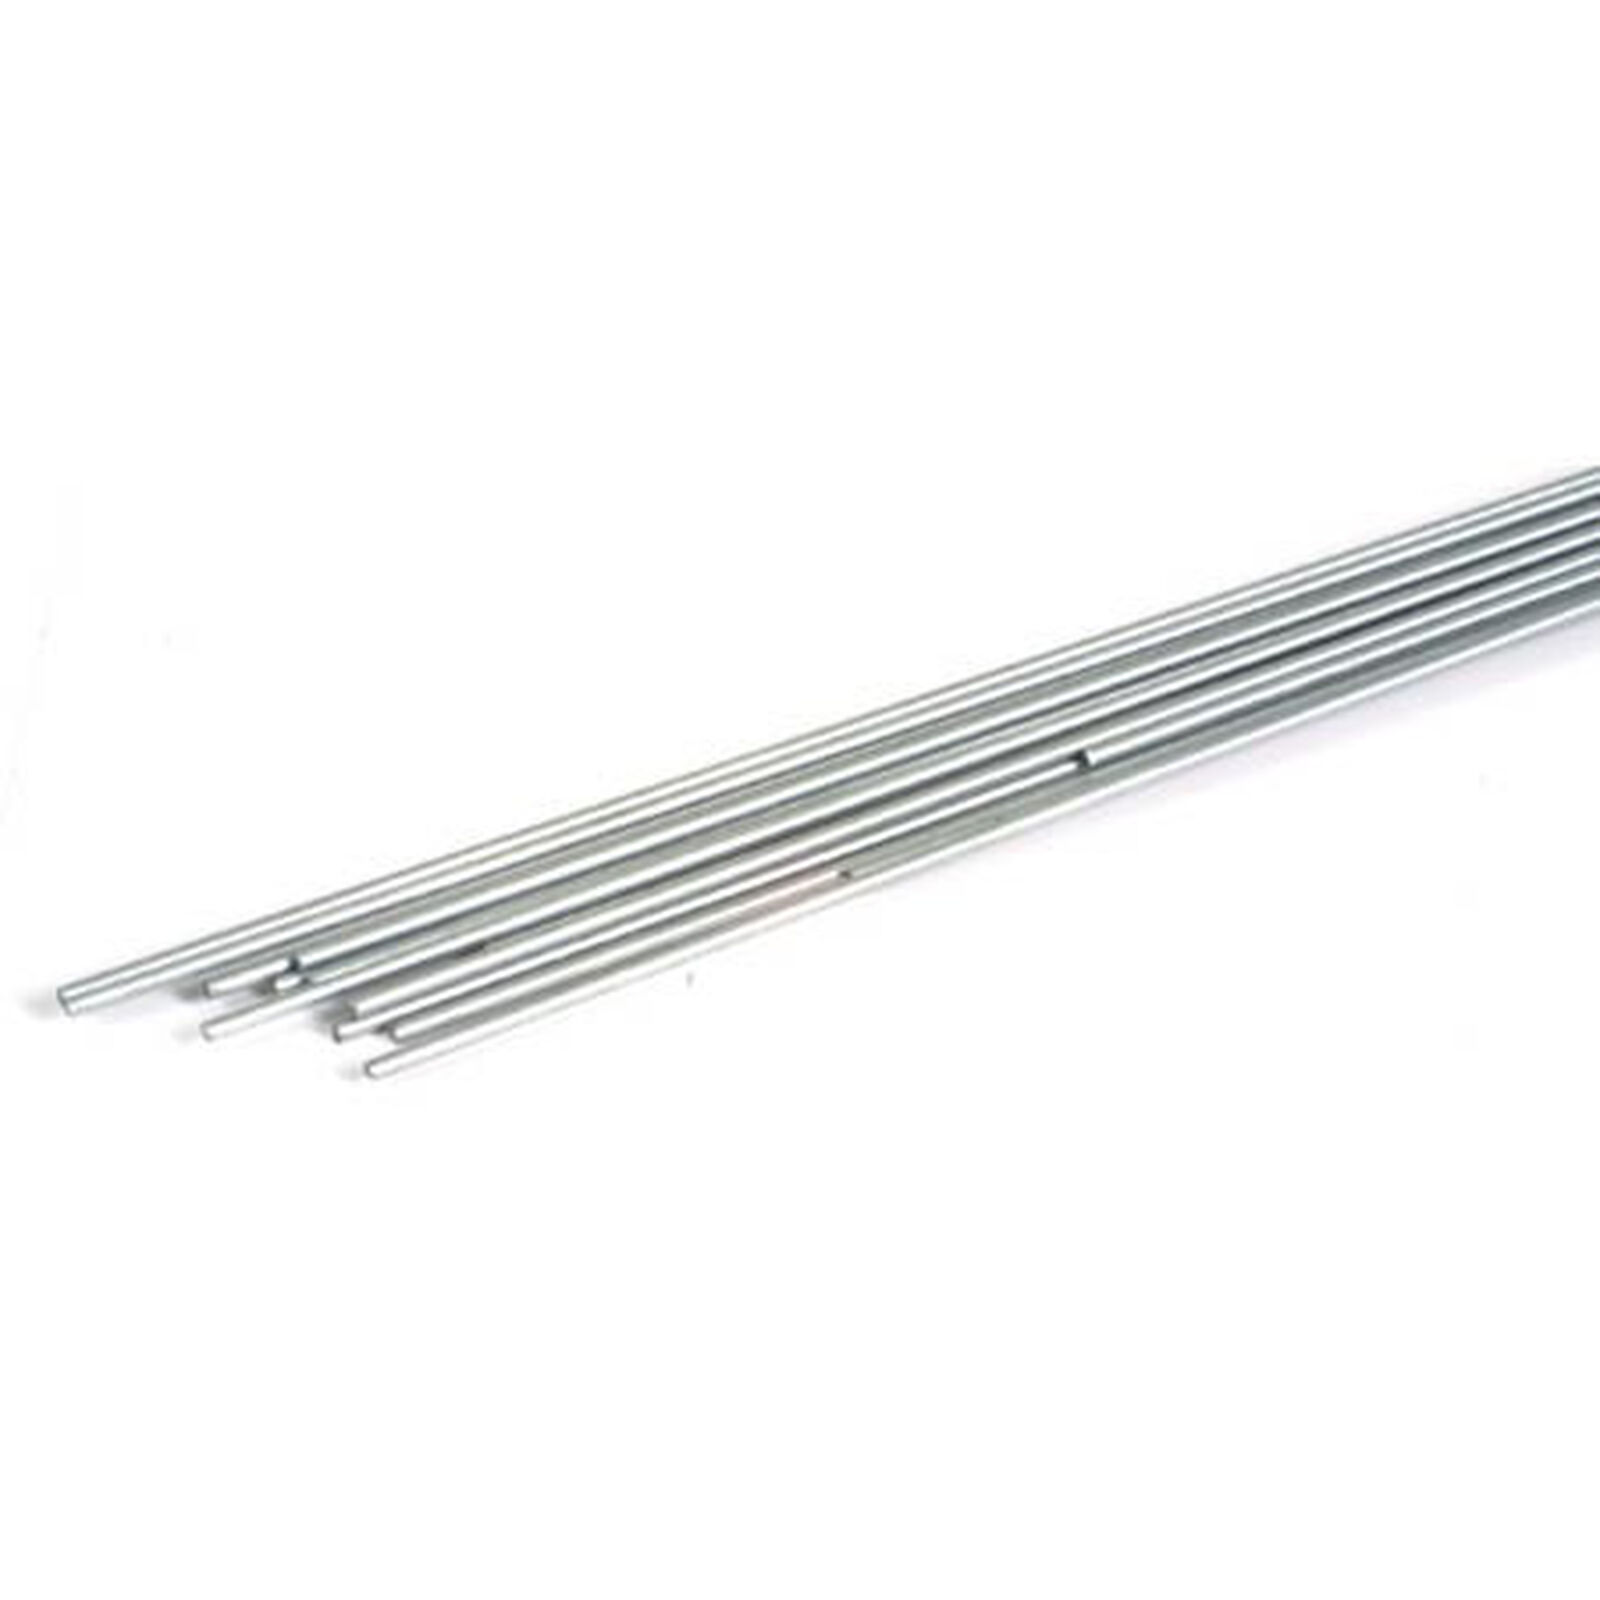 "Threaded Rods, 2-56 x 48"" (24)"